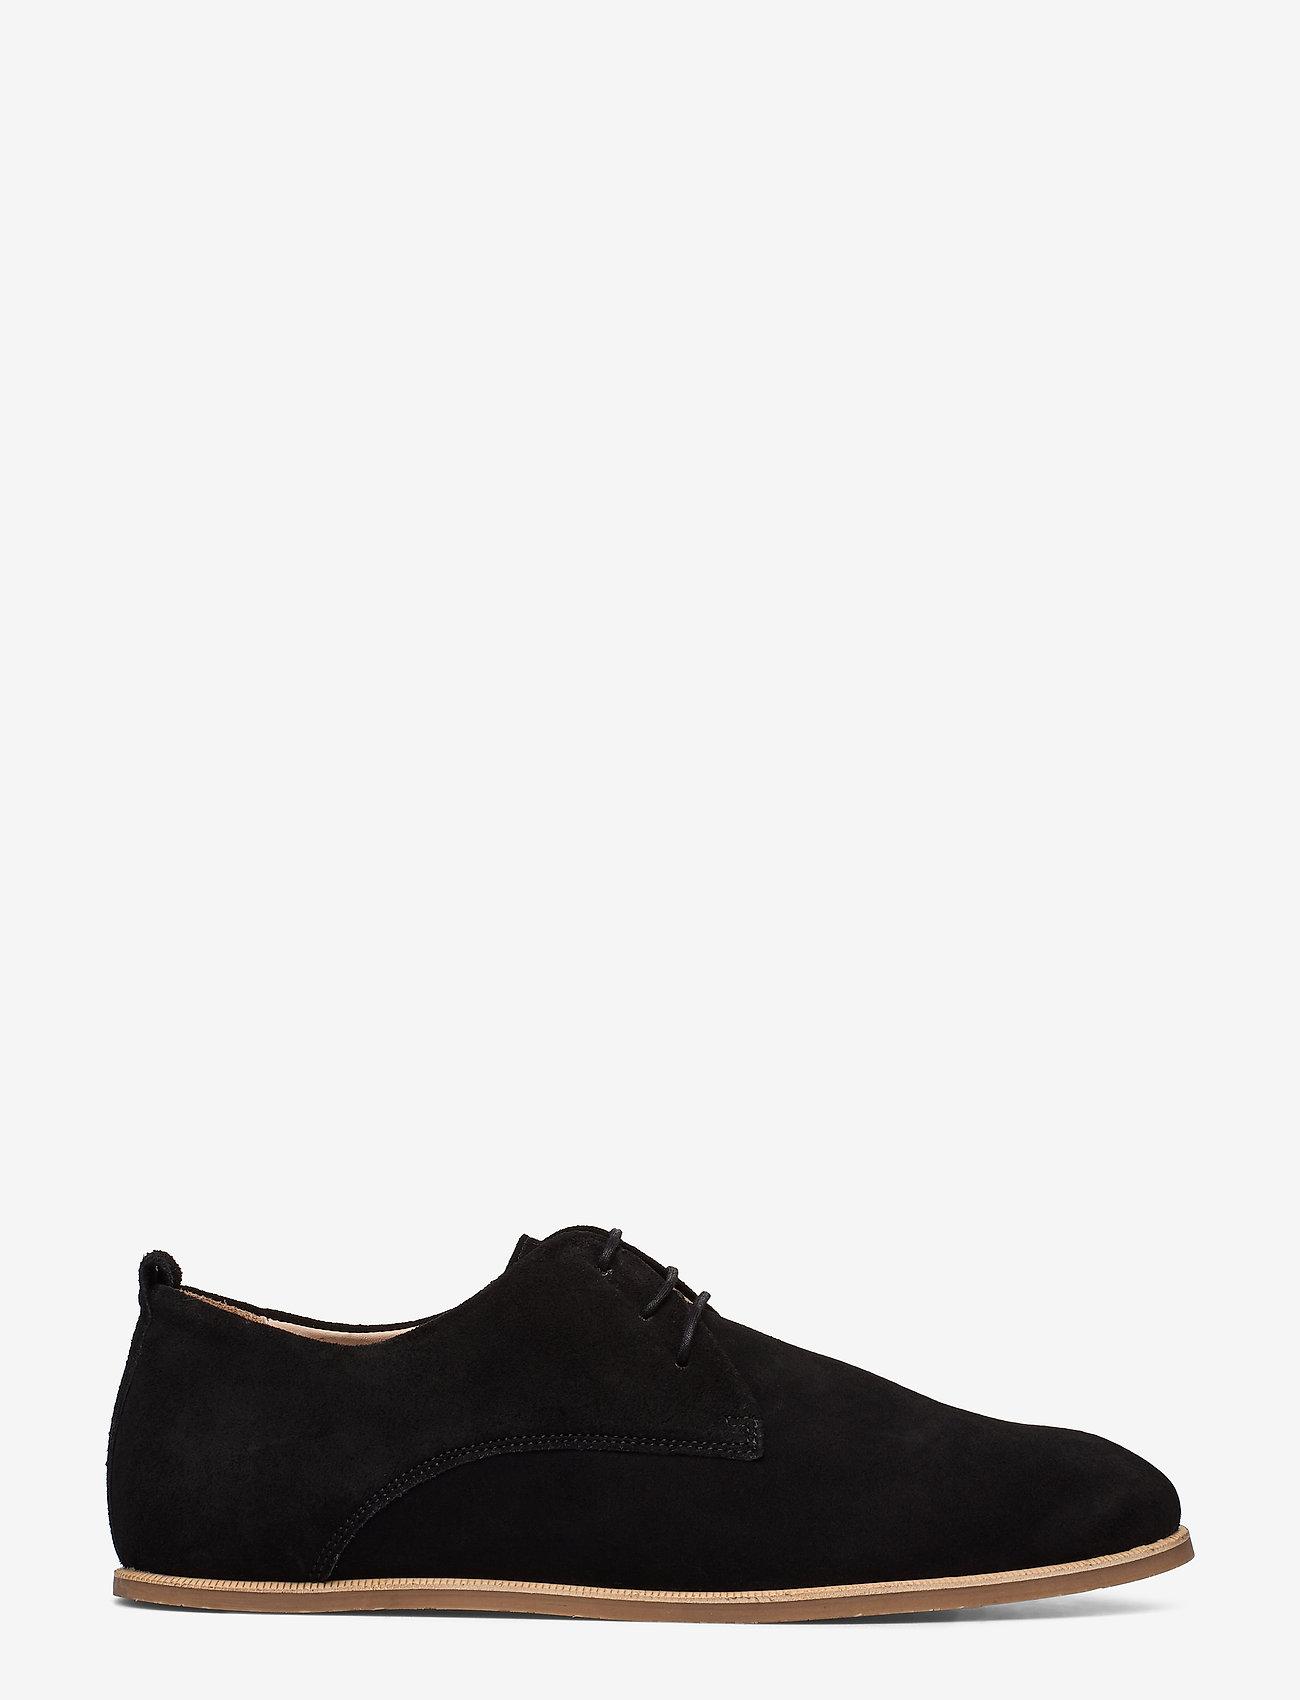 Royal RepubliQ Evo Suede Derby Shoe - Business BLACK - Schuhe Billige